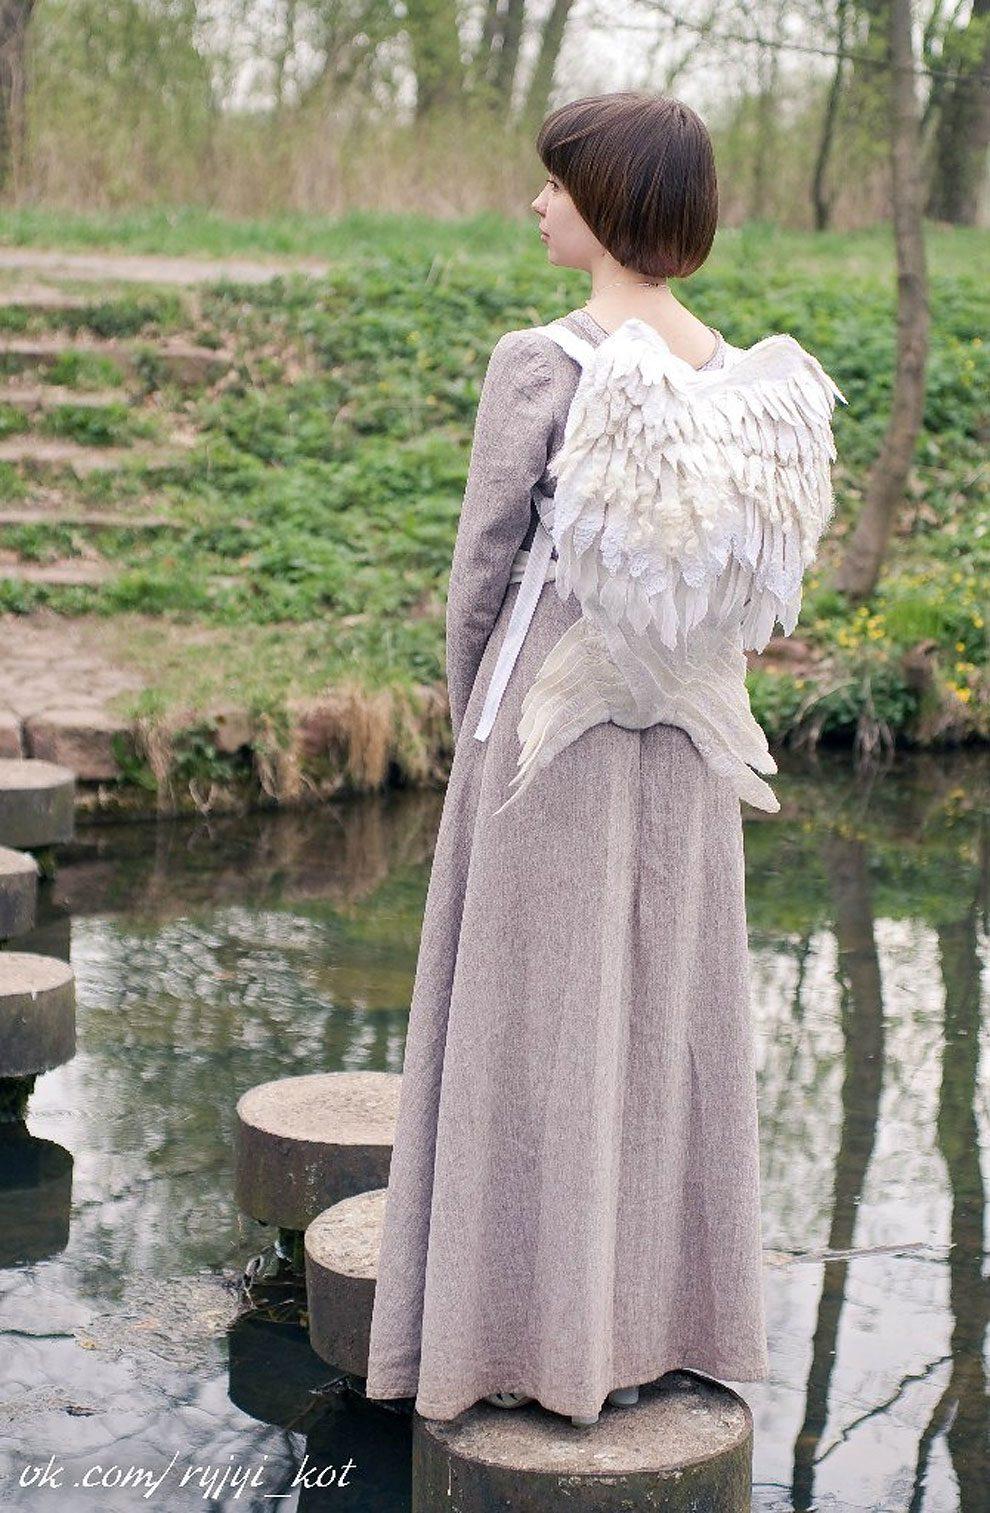 zaino-ali-angelo-feltro-volha-kotova-09